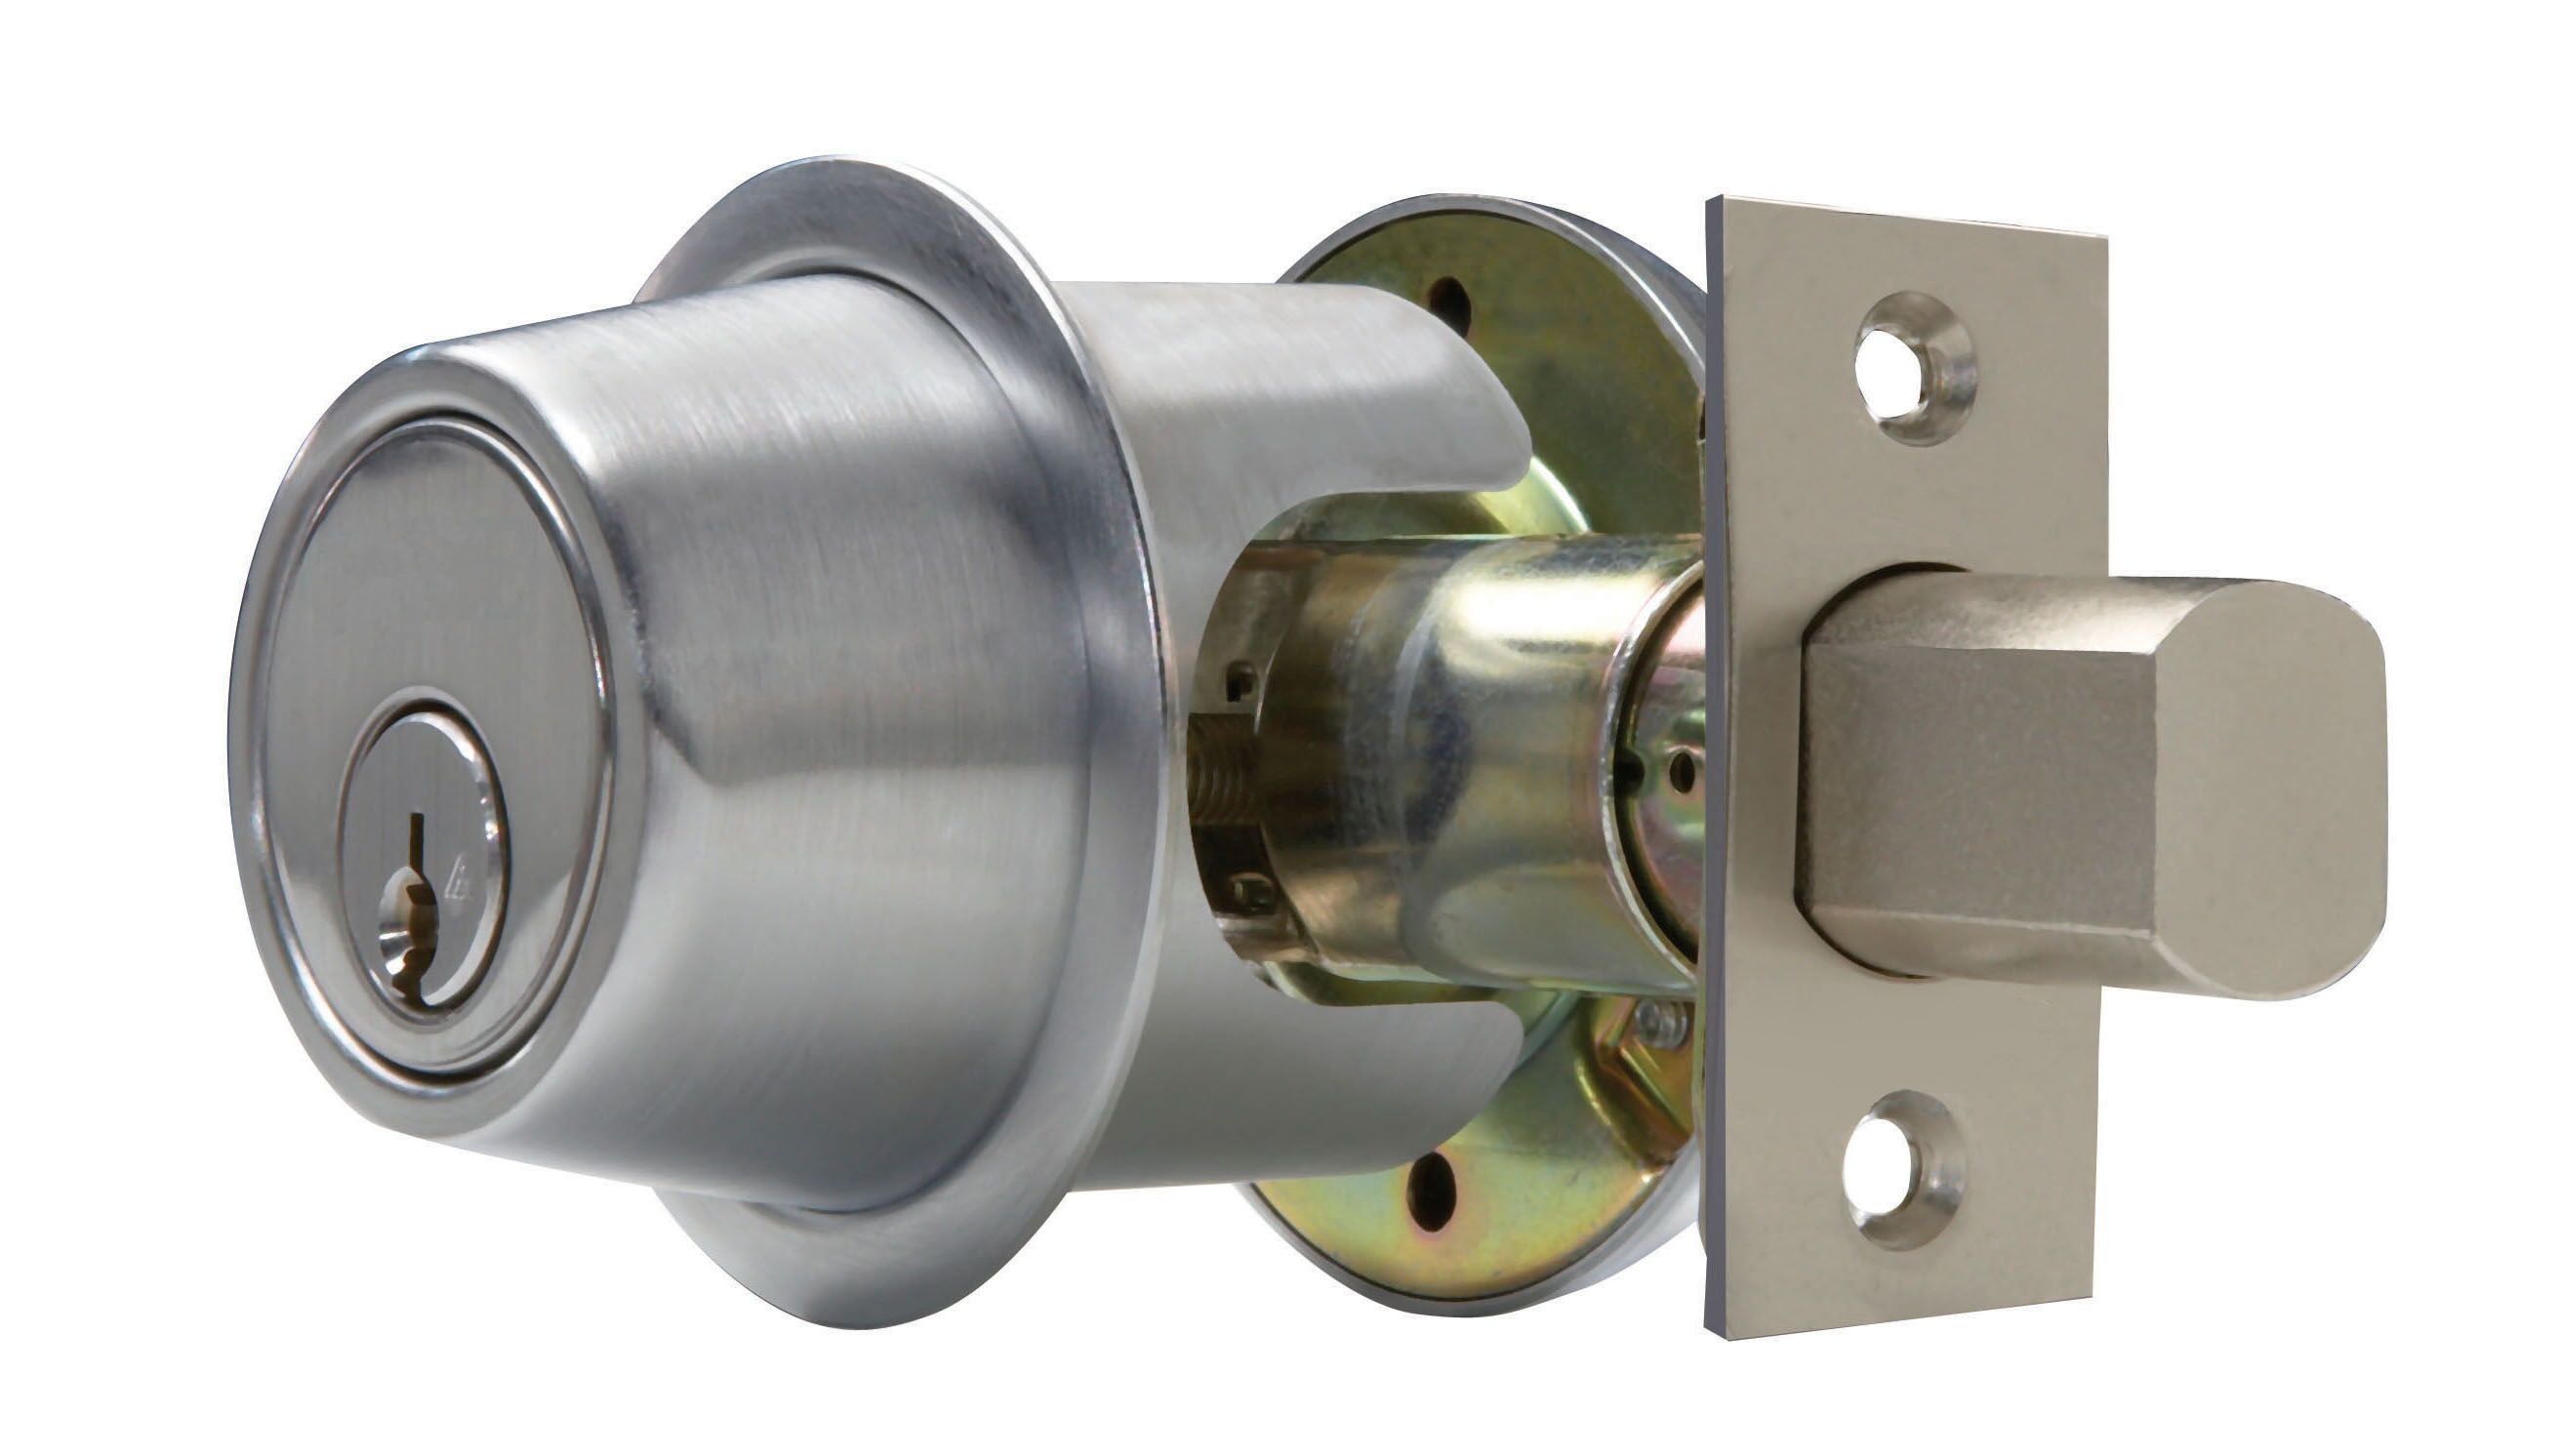 Broward Palm Beach Counties 24 Hour Lock Installation Services For Door Locks Including Combination Locks Safe Loc Double Cylinder Deadbolt Schlage Deadbolt